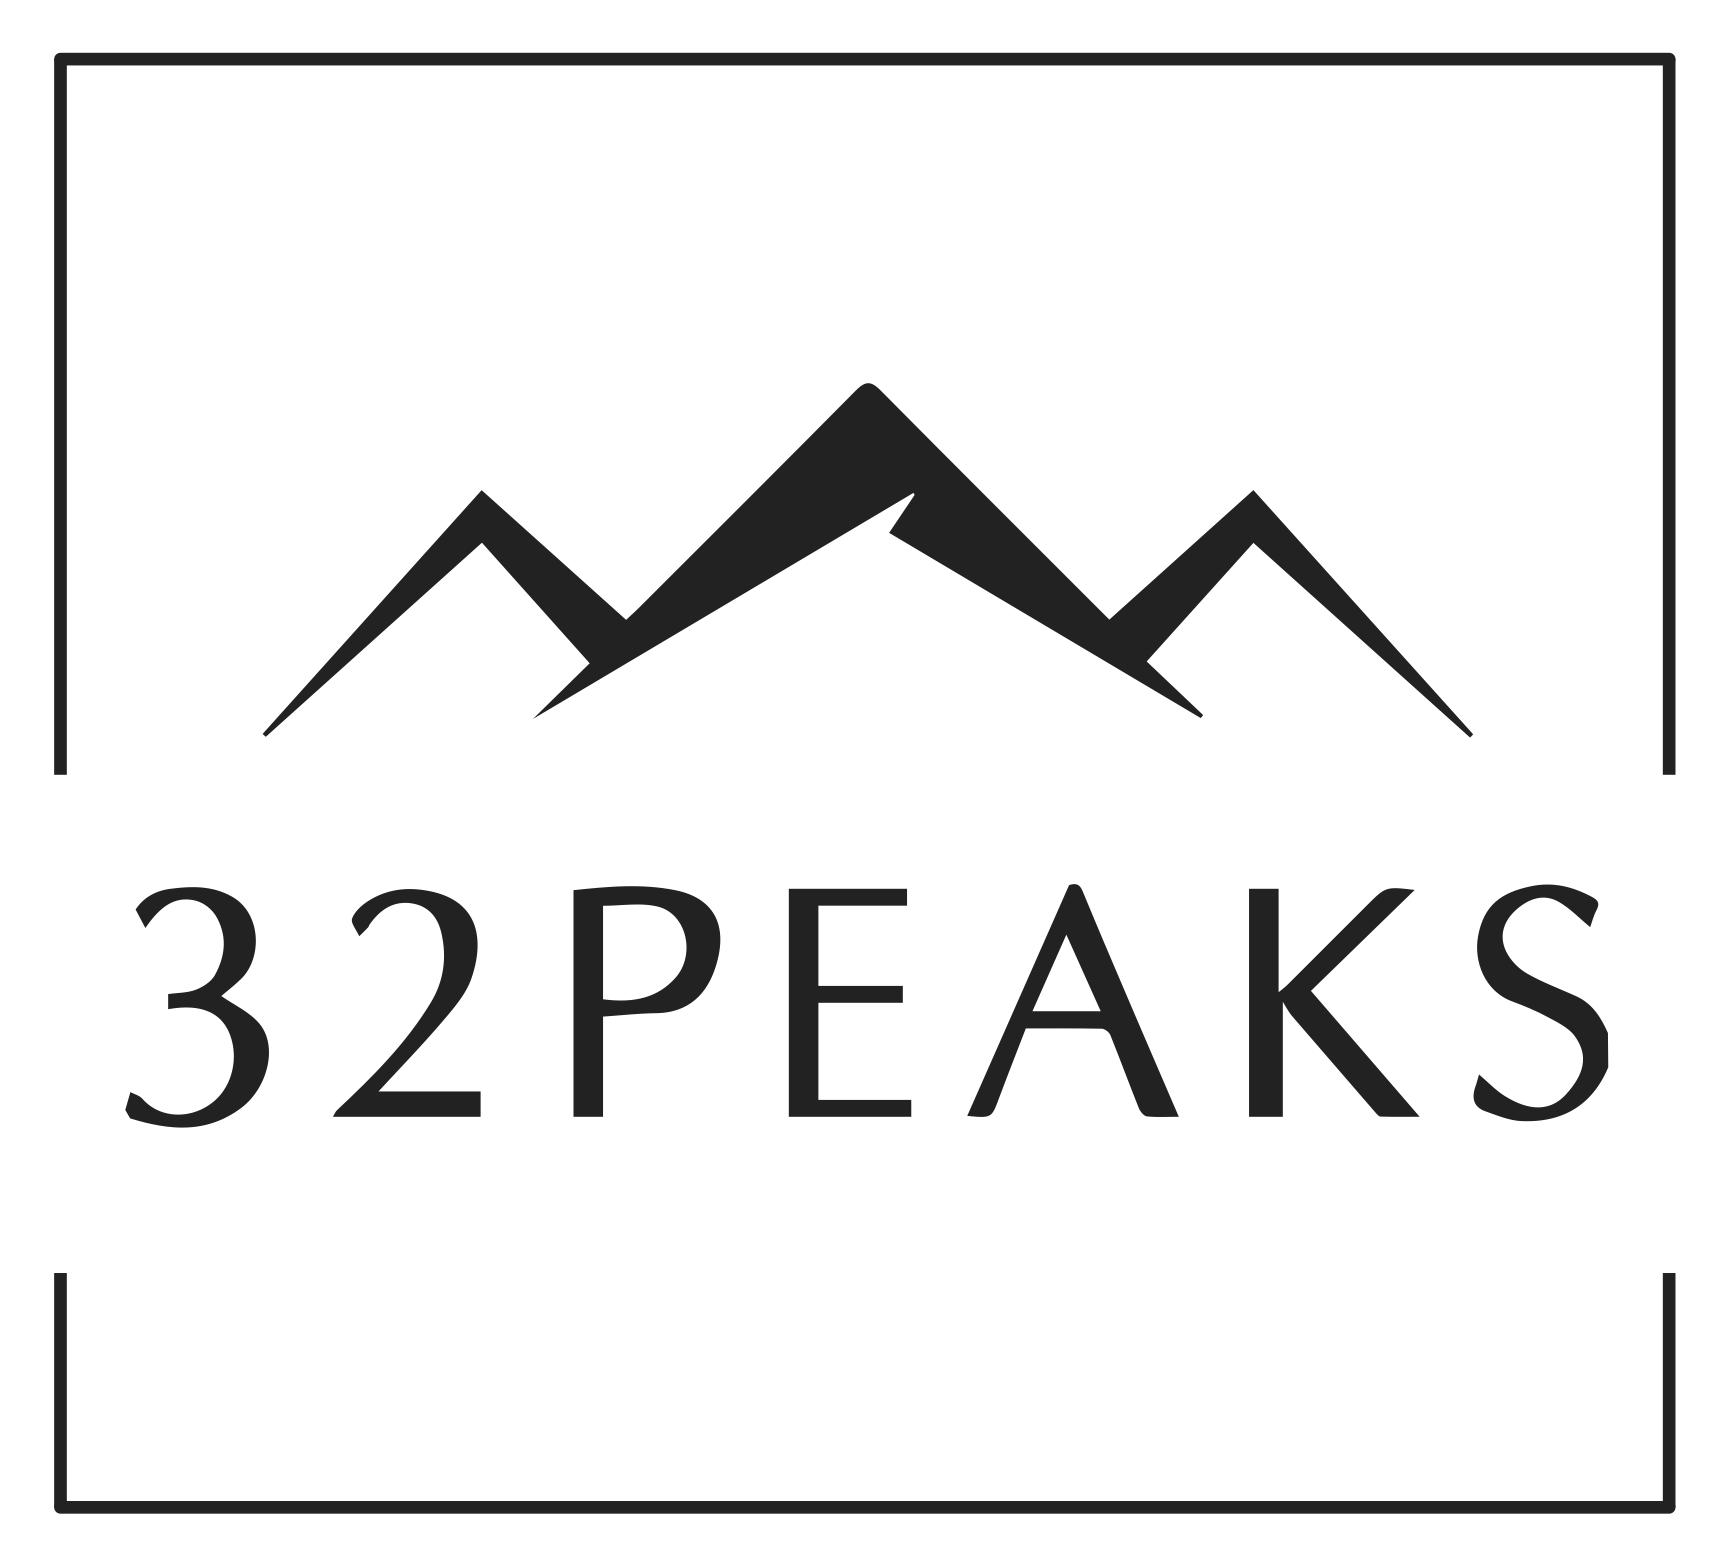 32PEAKS